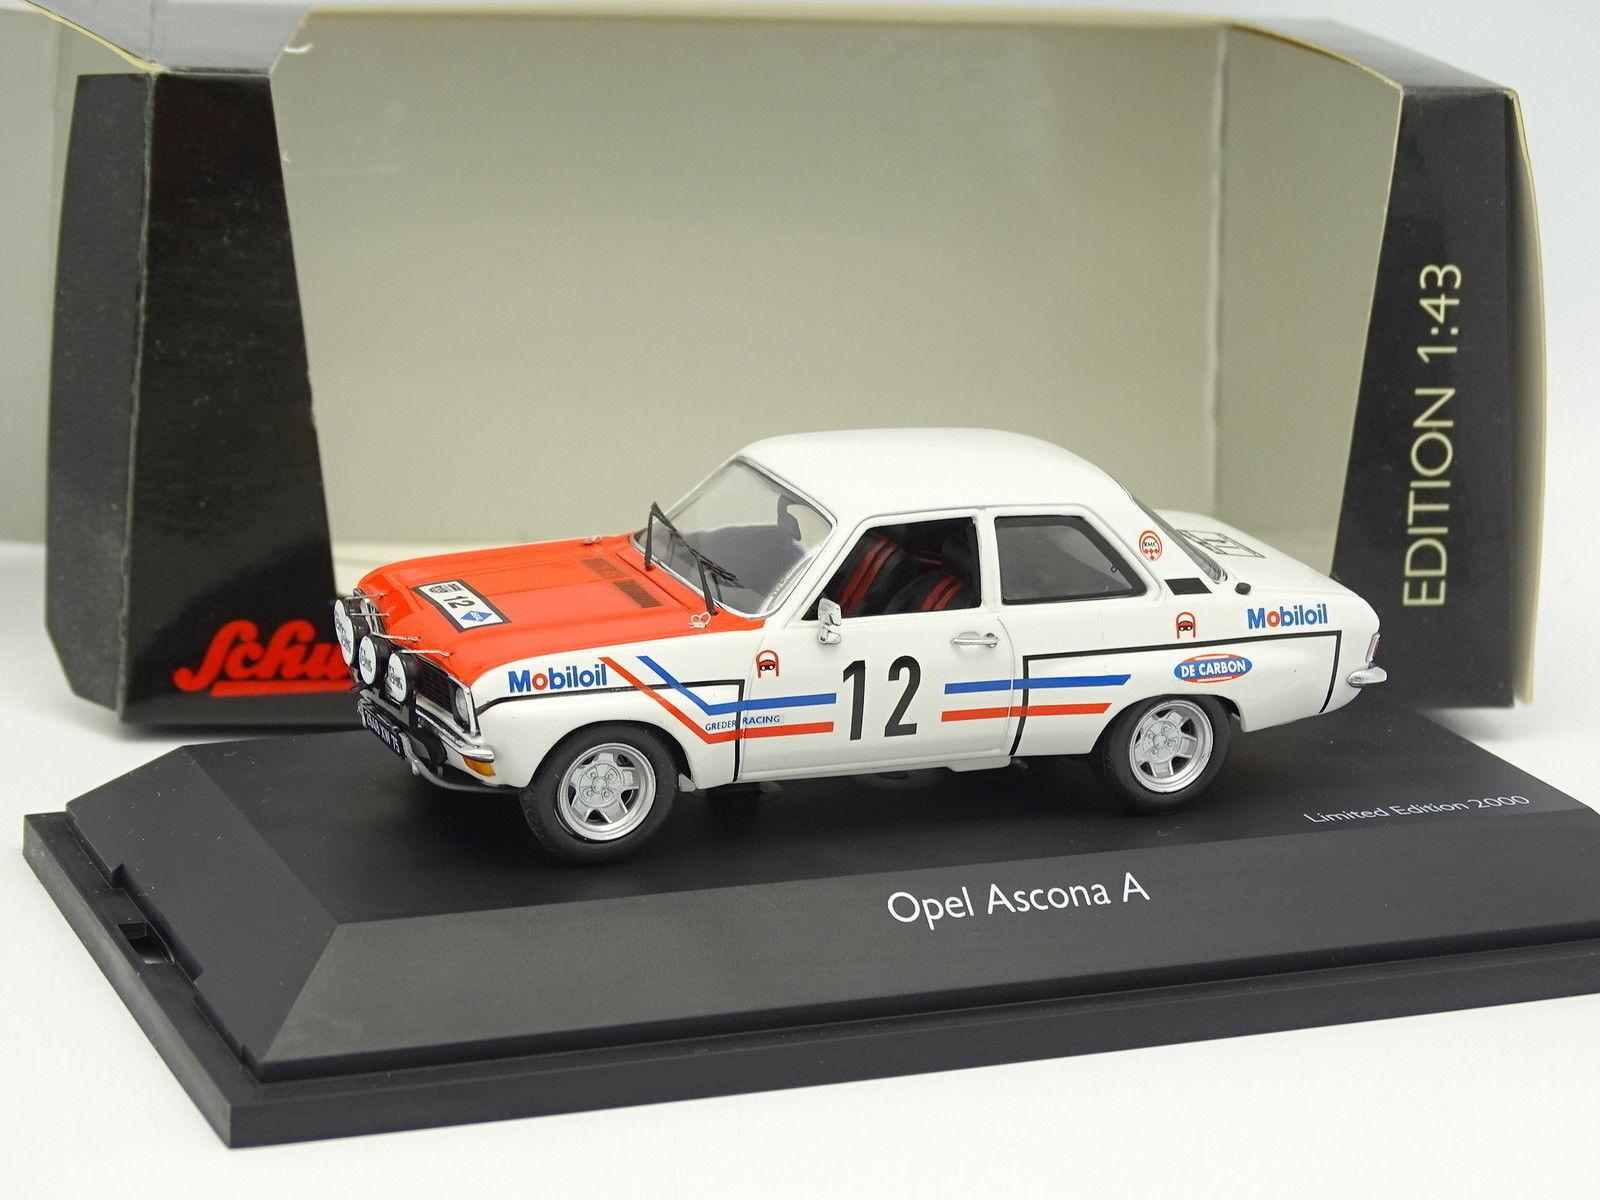 Schuco 1 43 - Opel Ascona Ha Grossoer Carreras